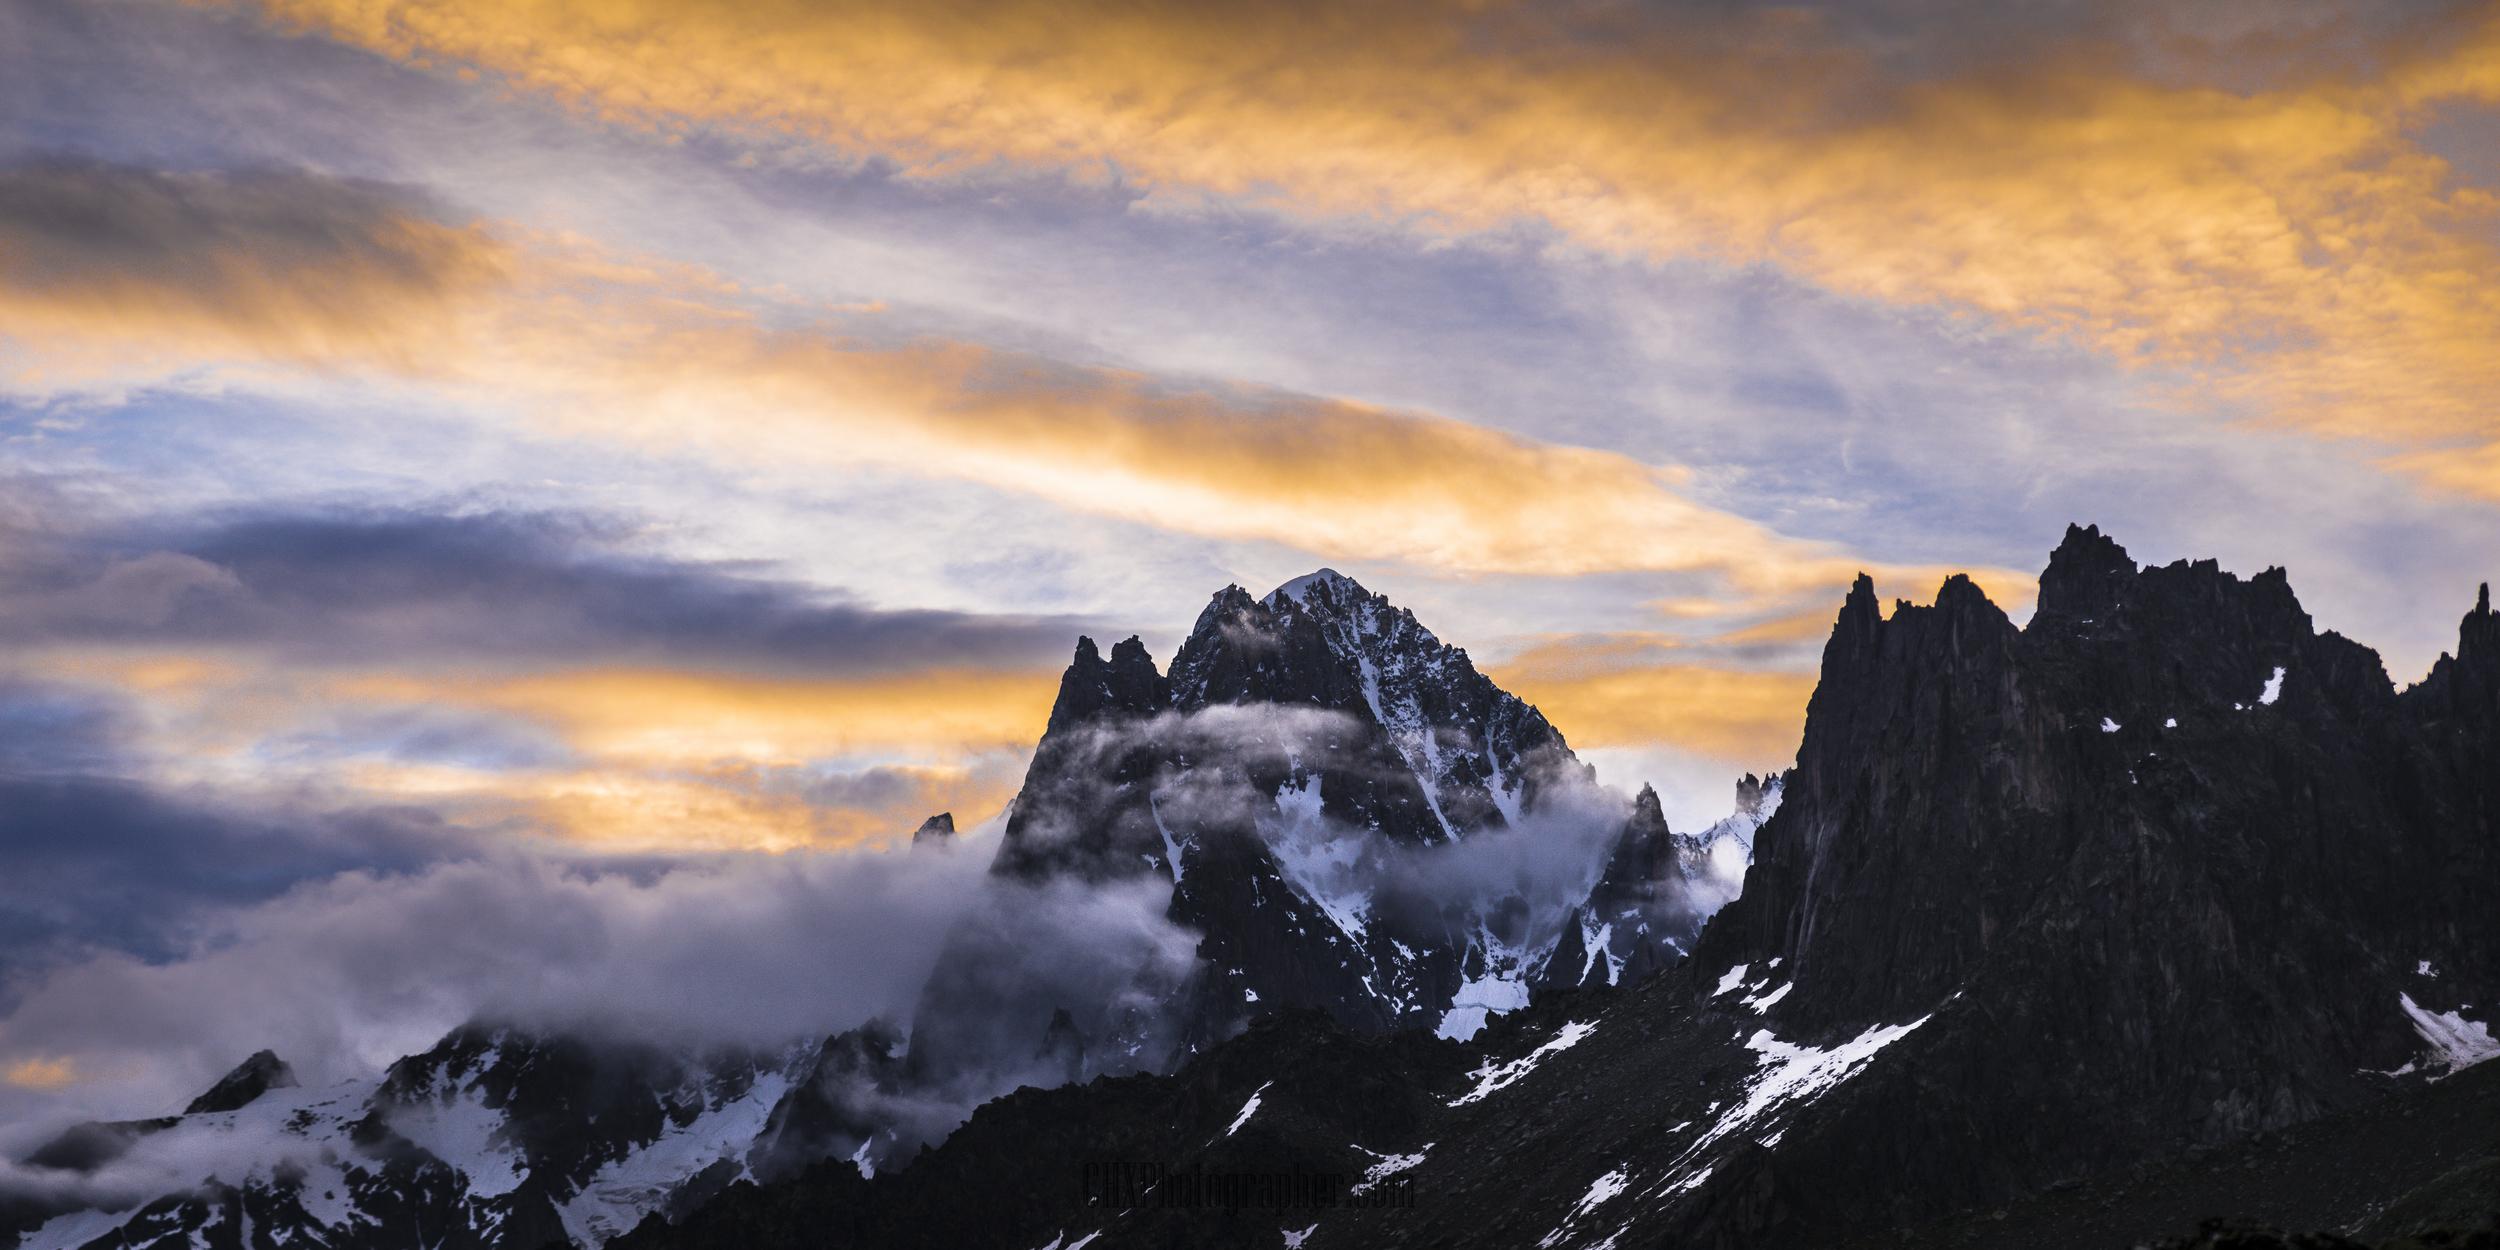 The Aiguille Verte in Chamonix, France